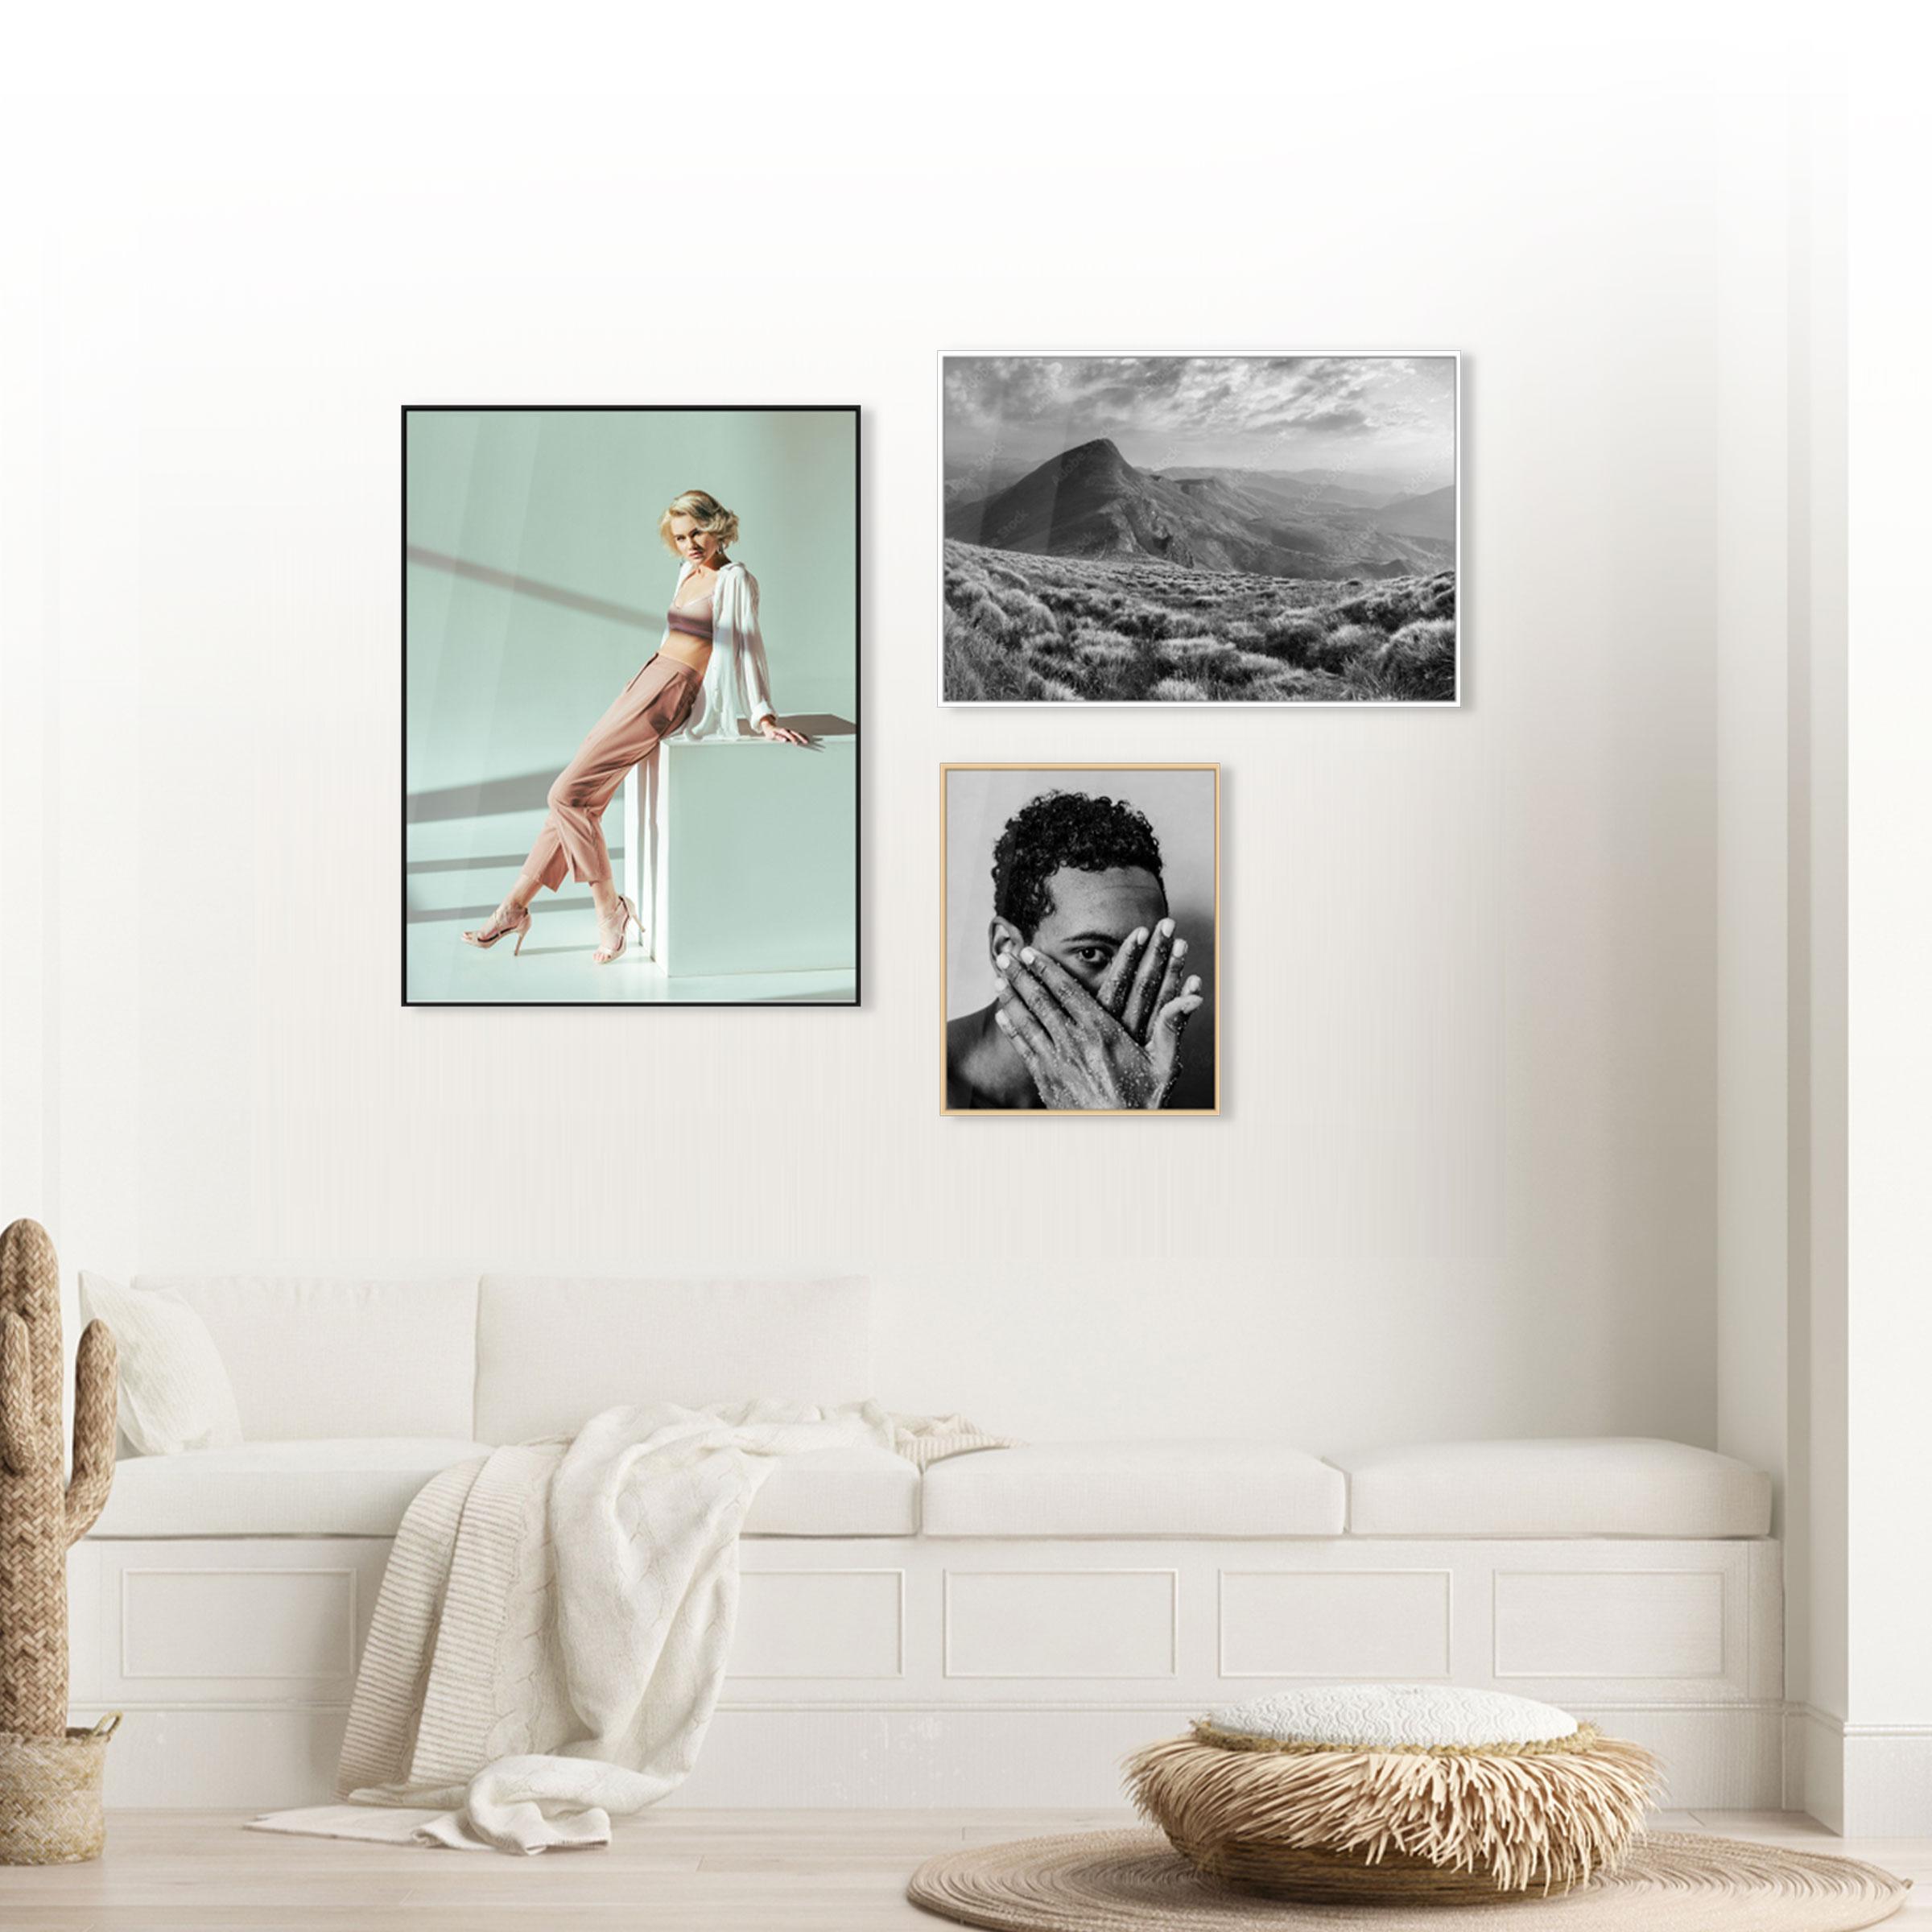 slimline-inspiration-1200x1200.jpg